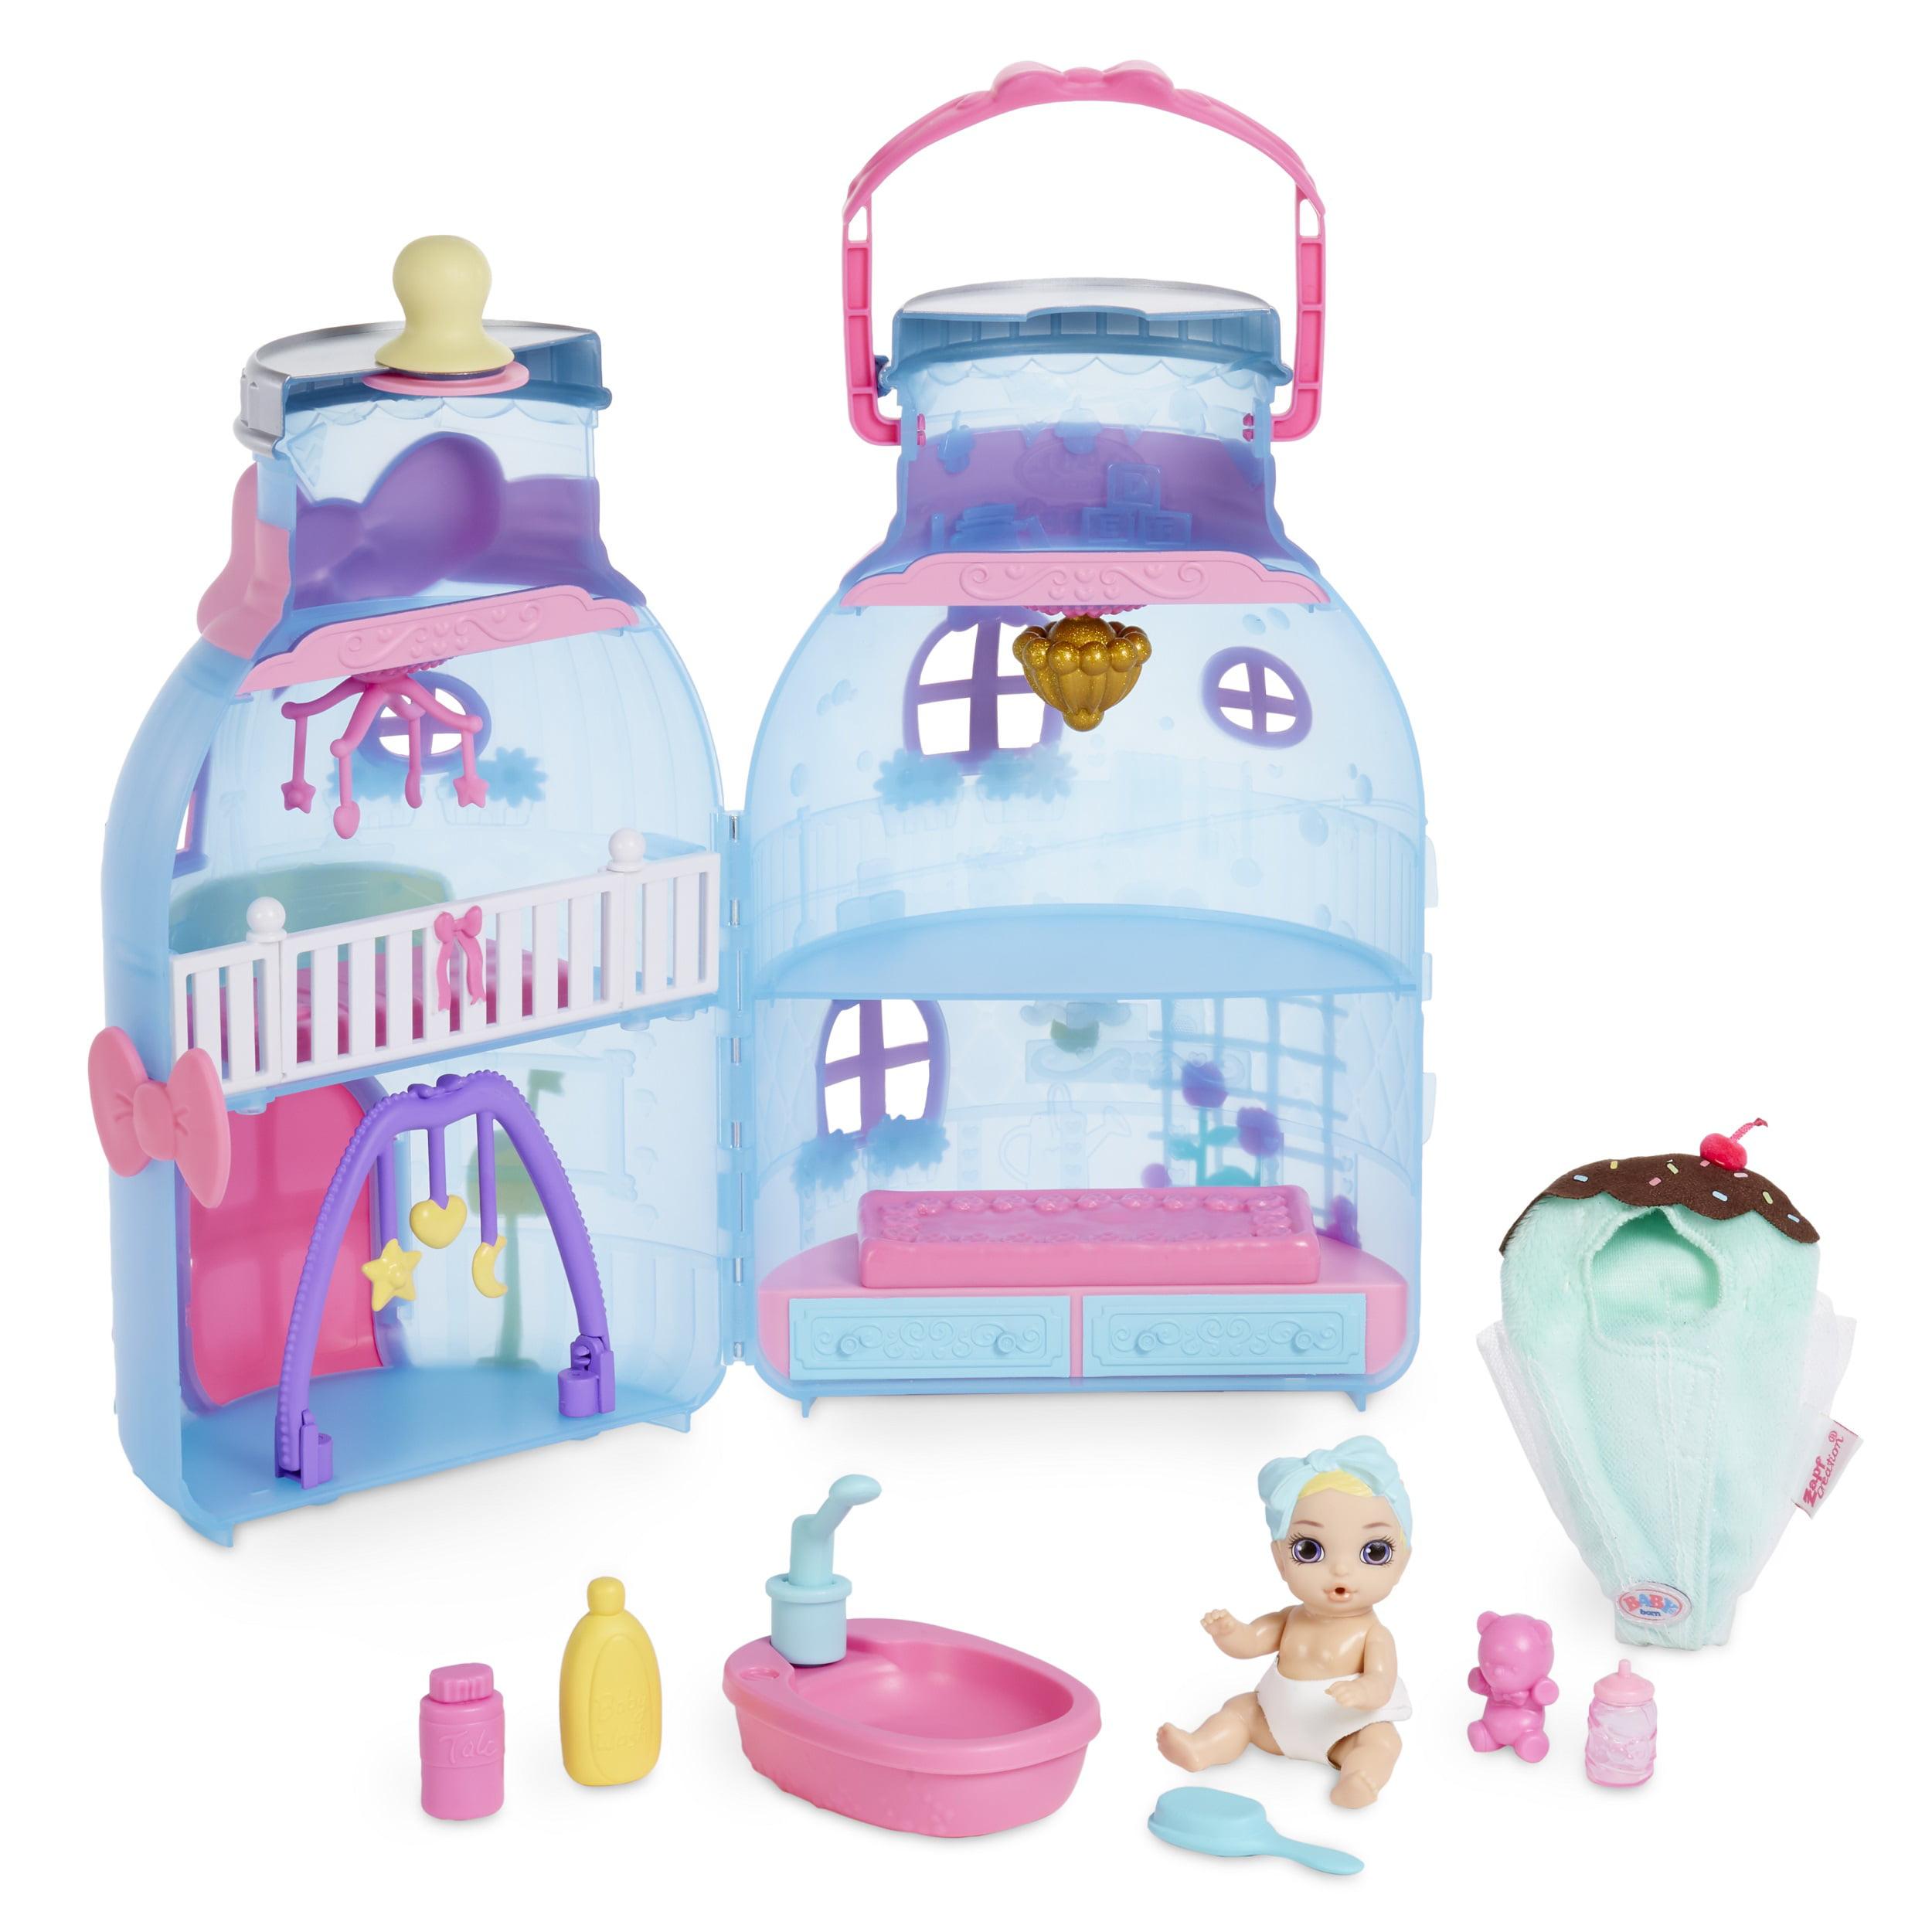 Baby Born Surprise Baby Bottle House with 20+ Surprises - Walmart.com